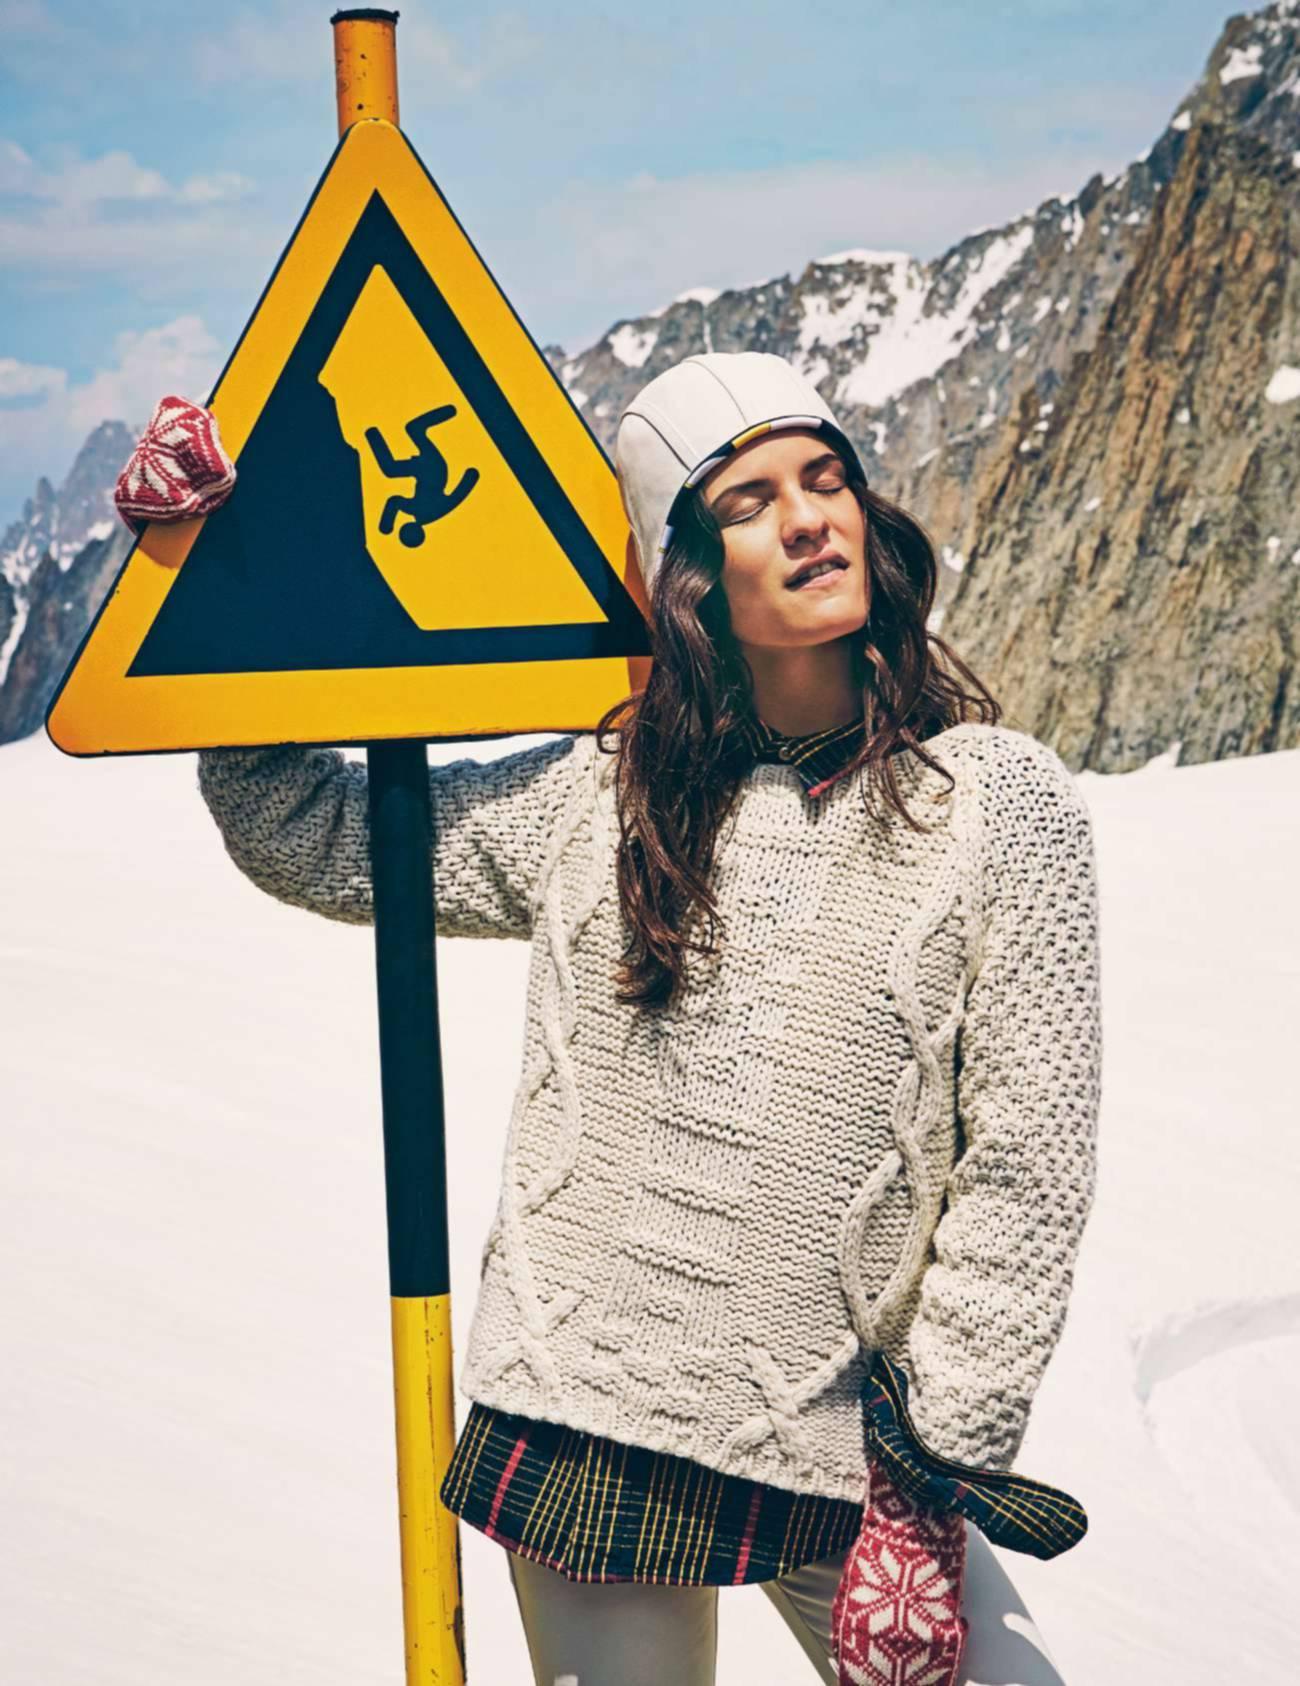 свитер, ba&sh; рубашка, Levi's; брюки и шапка из телячьей кожи, Hermès; варежки, Kerstin Adolphson